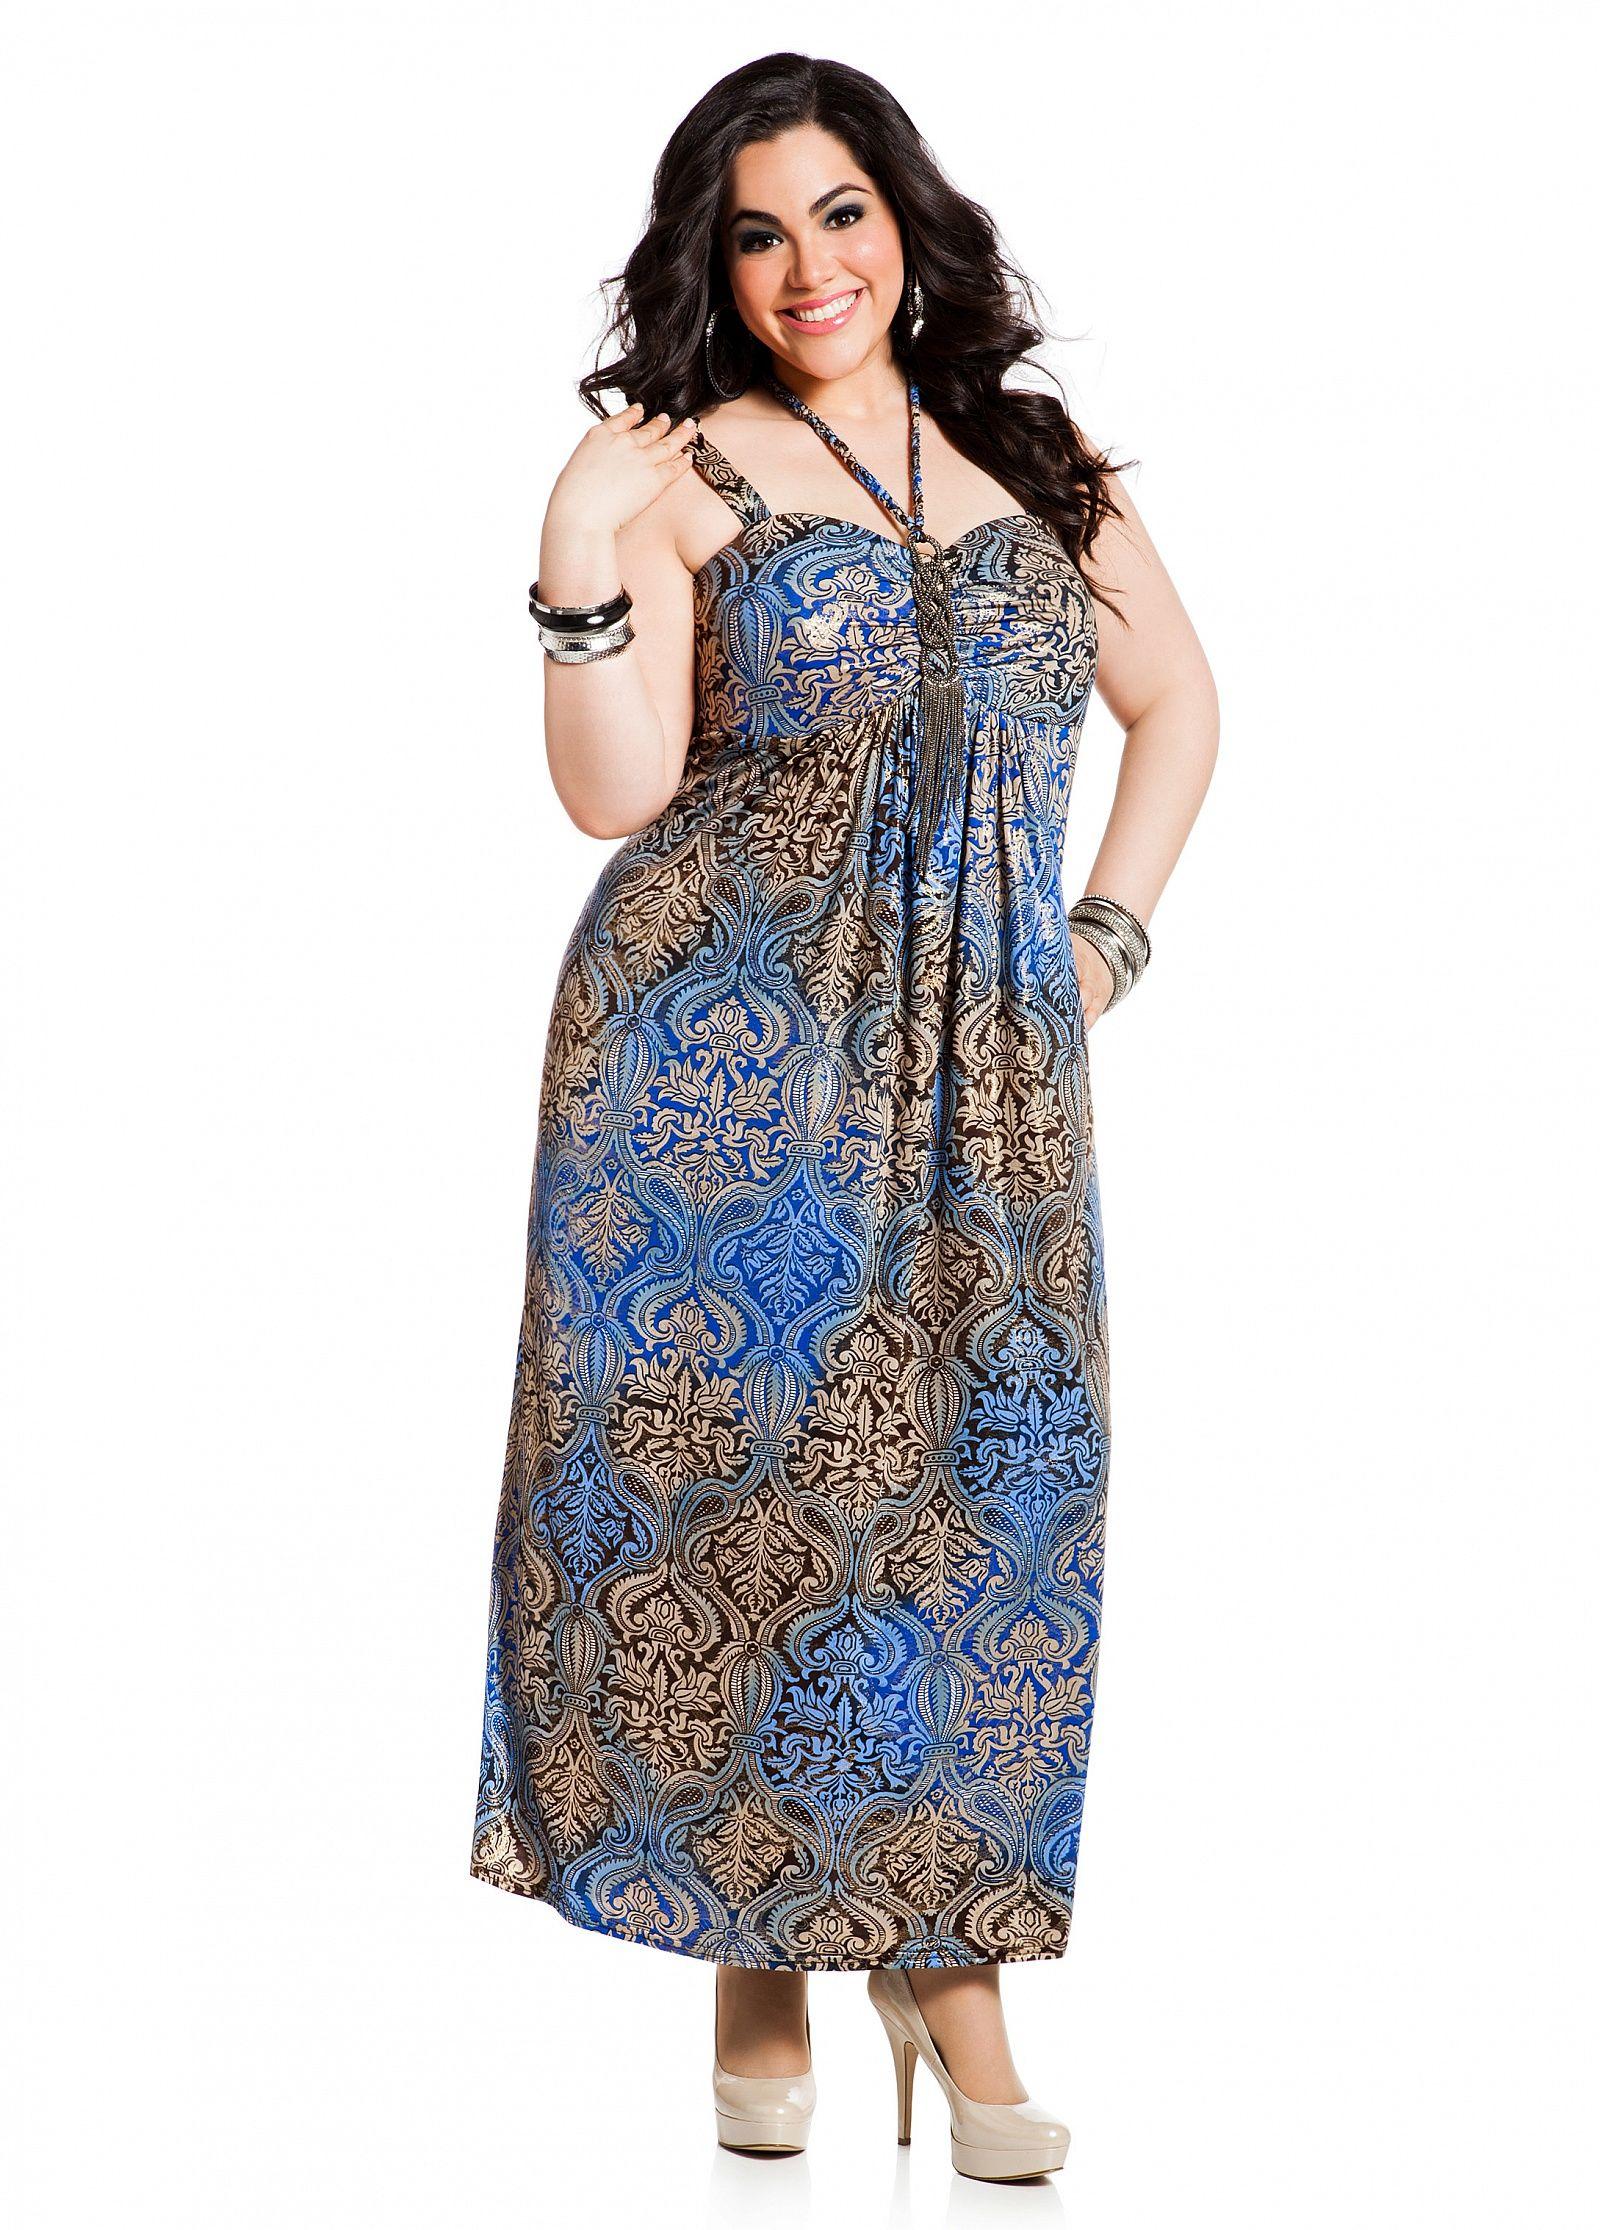 Ashley Stewart Web Exclusive Foil Yoryubatik Print Maxi Dress Plus Size Maxi Dresses Plus Size Outfits Dresses [ 2230 x 1600 Pixel ]